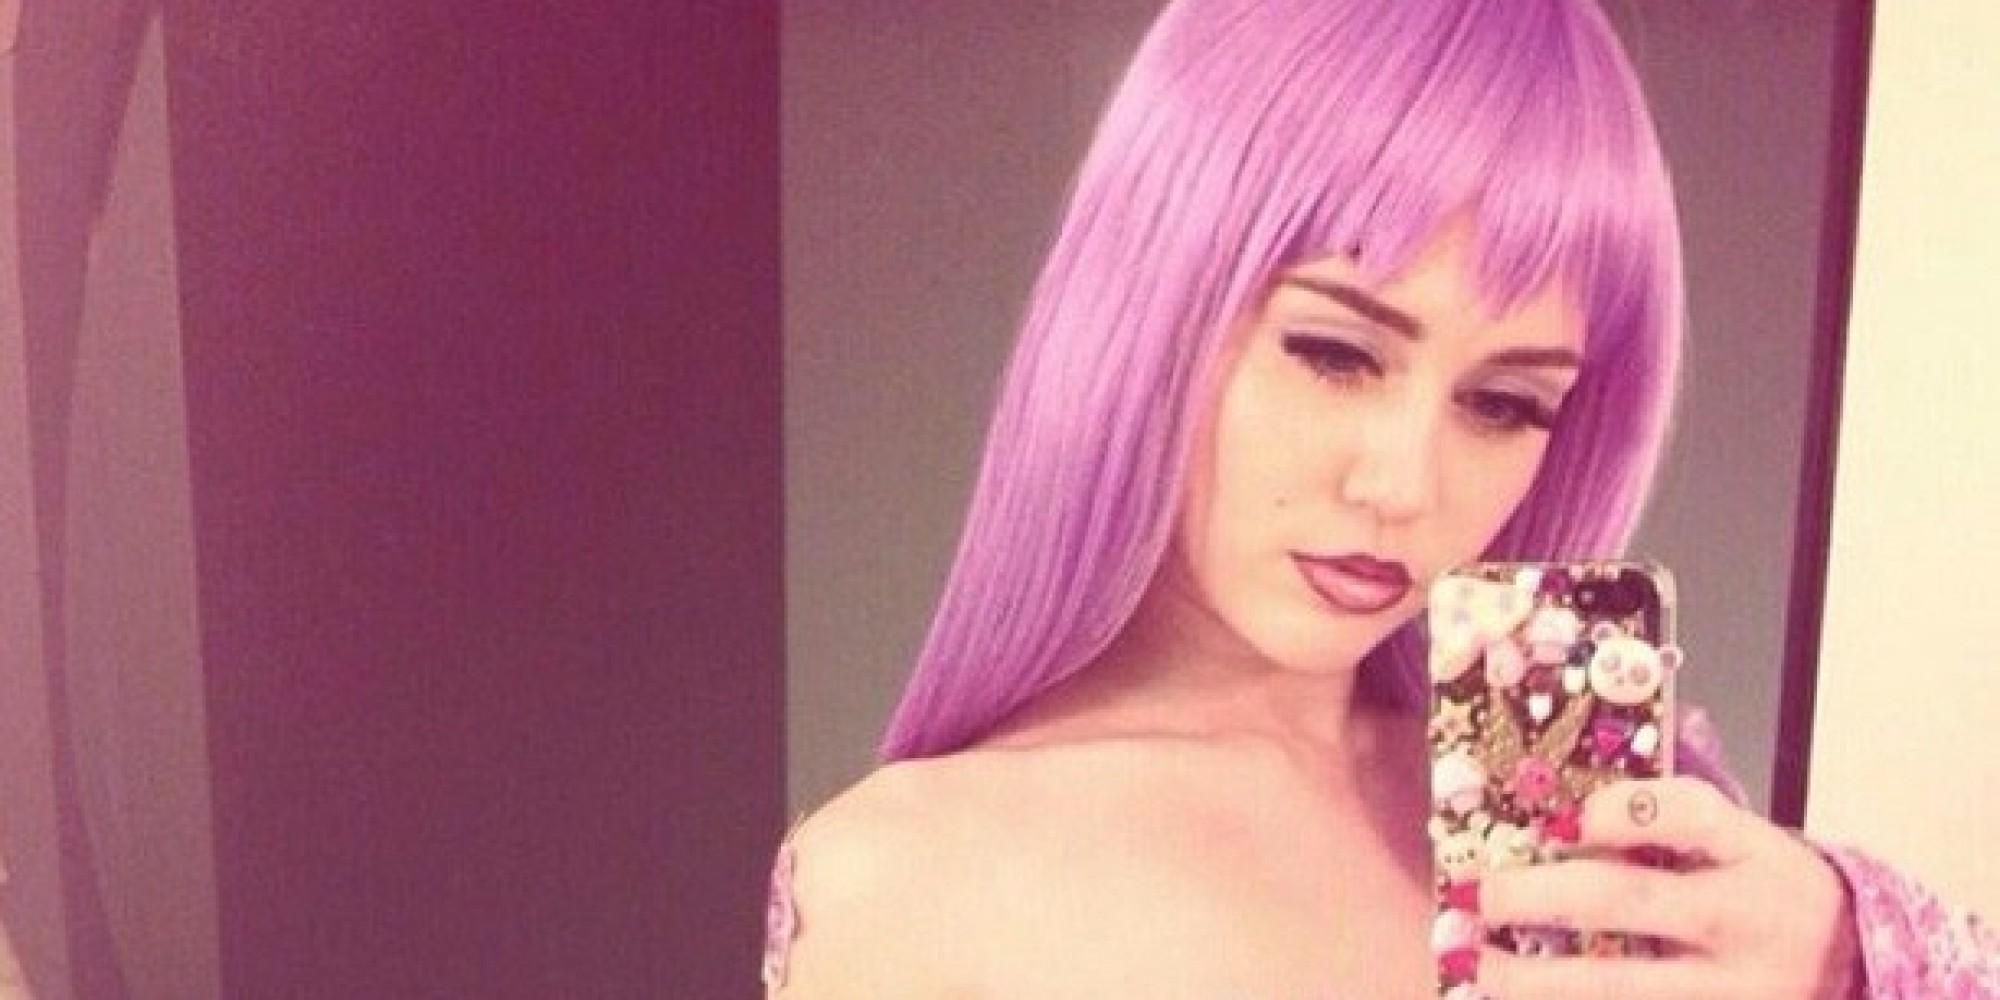 Miley Cyrus Dresses 2013 Miley Cyrus Dresses as Lil Kim